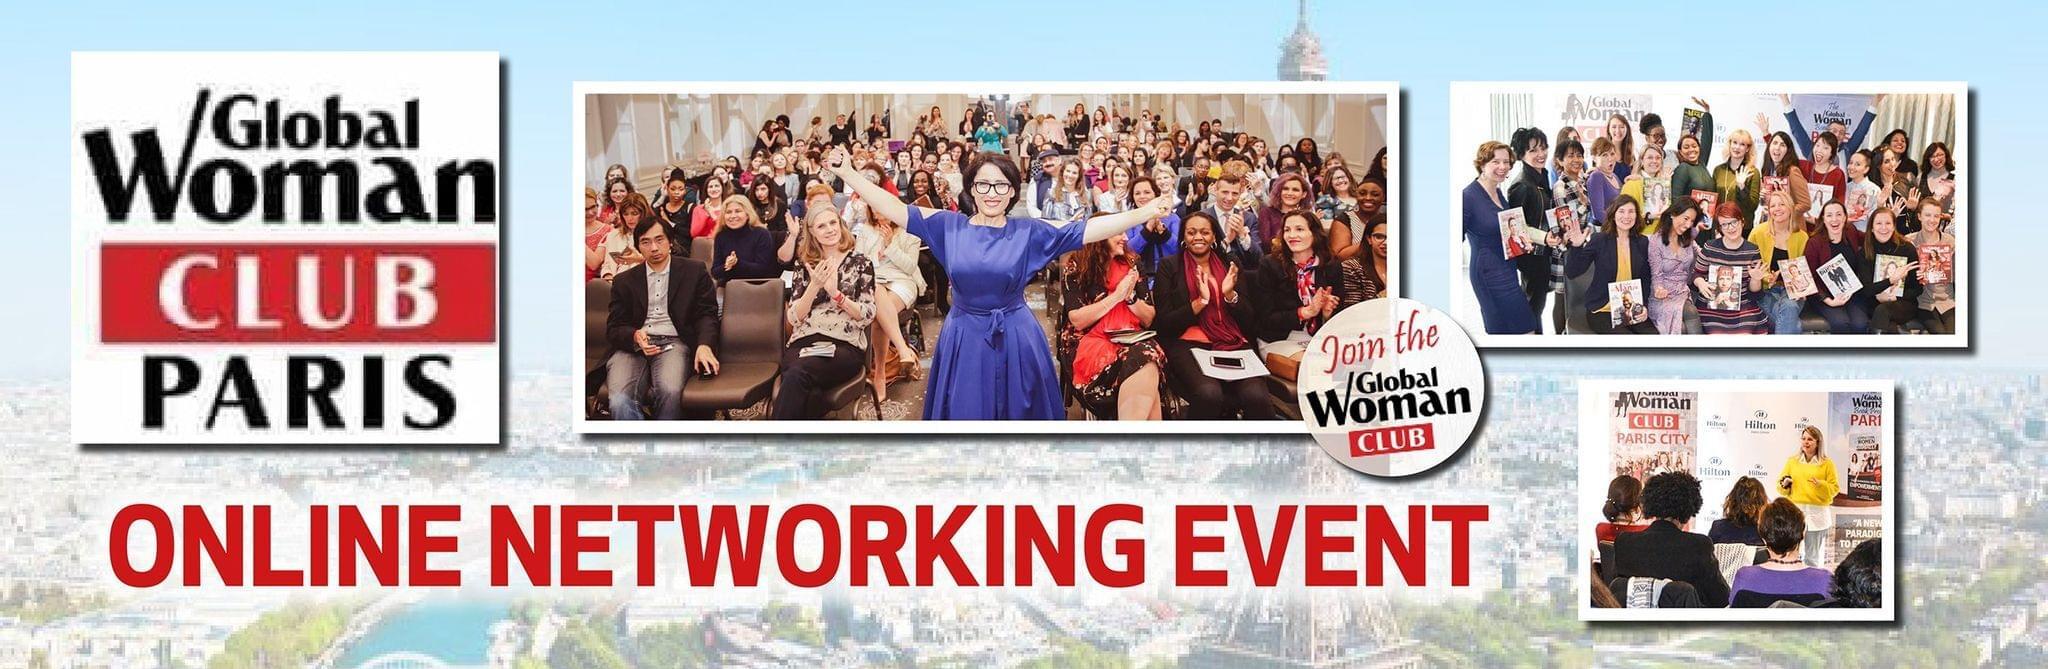 Global Woman Club Paris Meeting